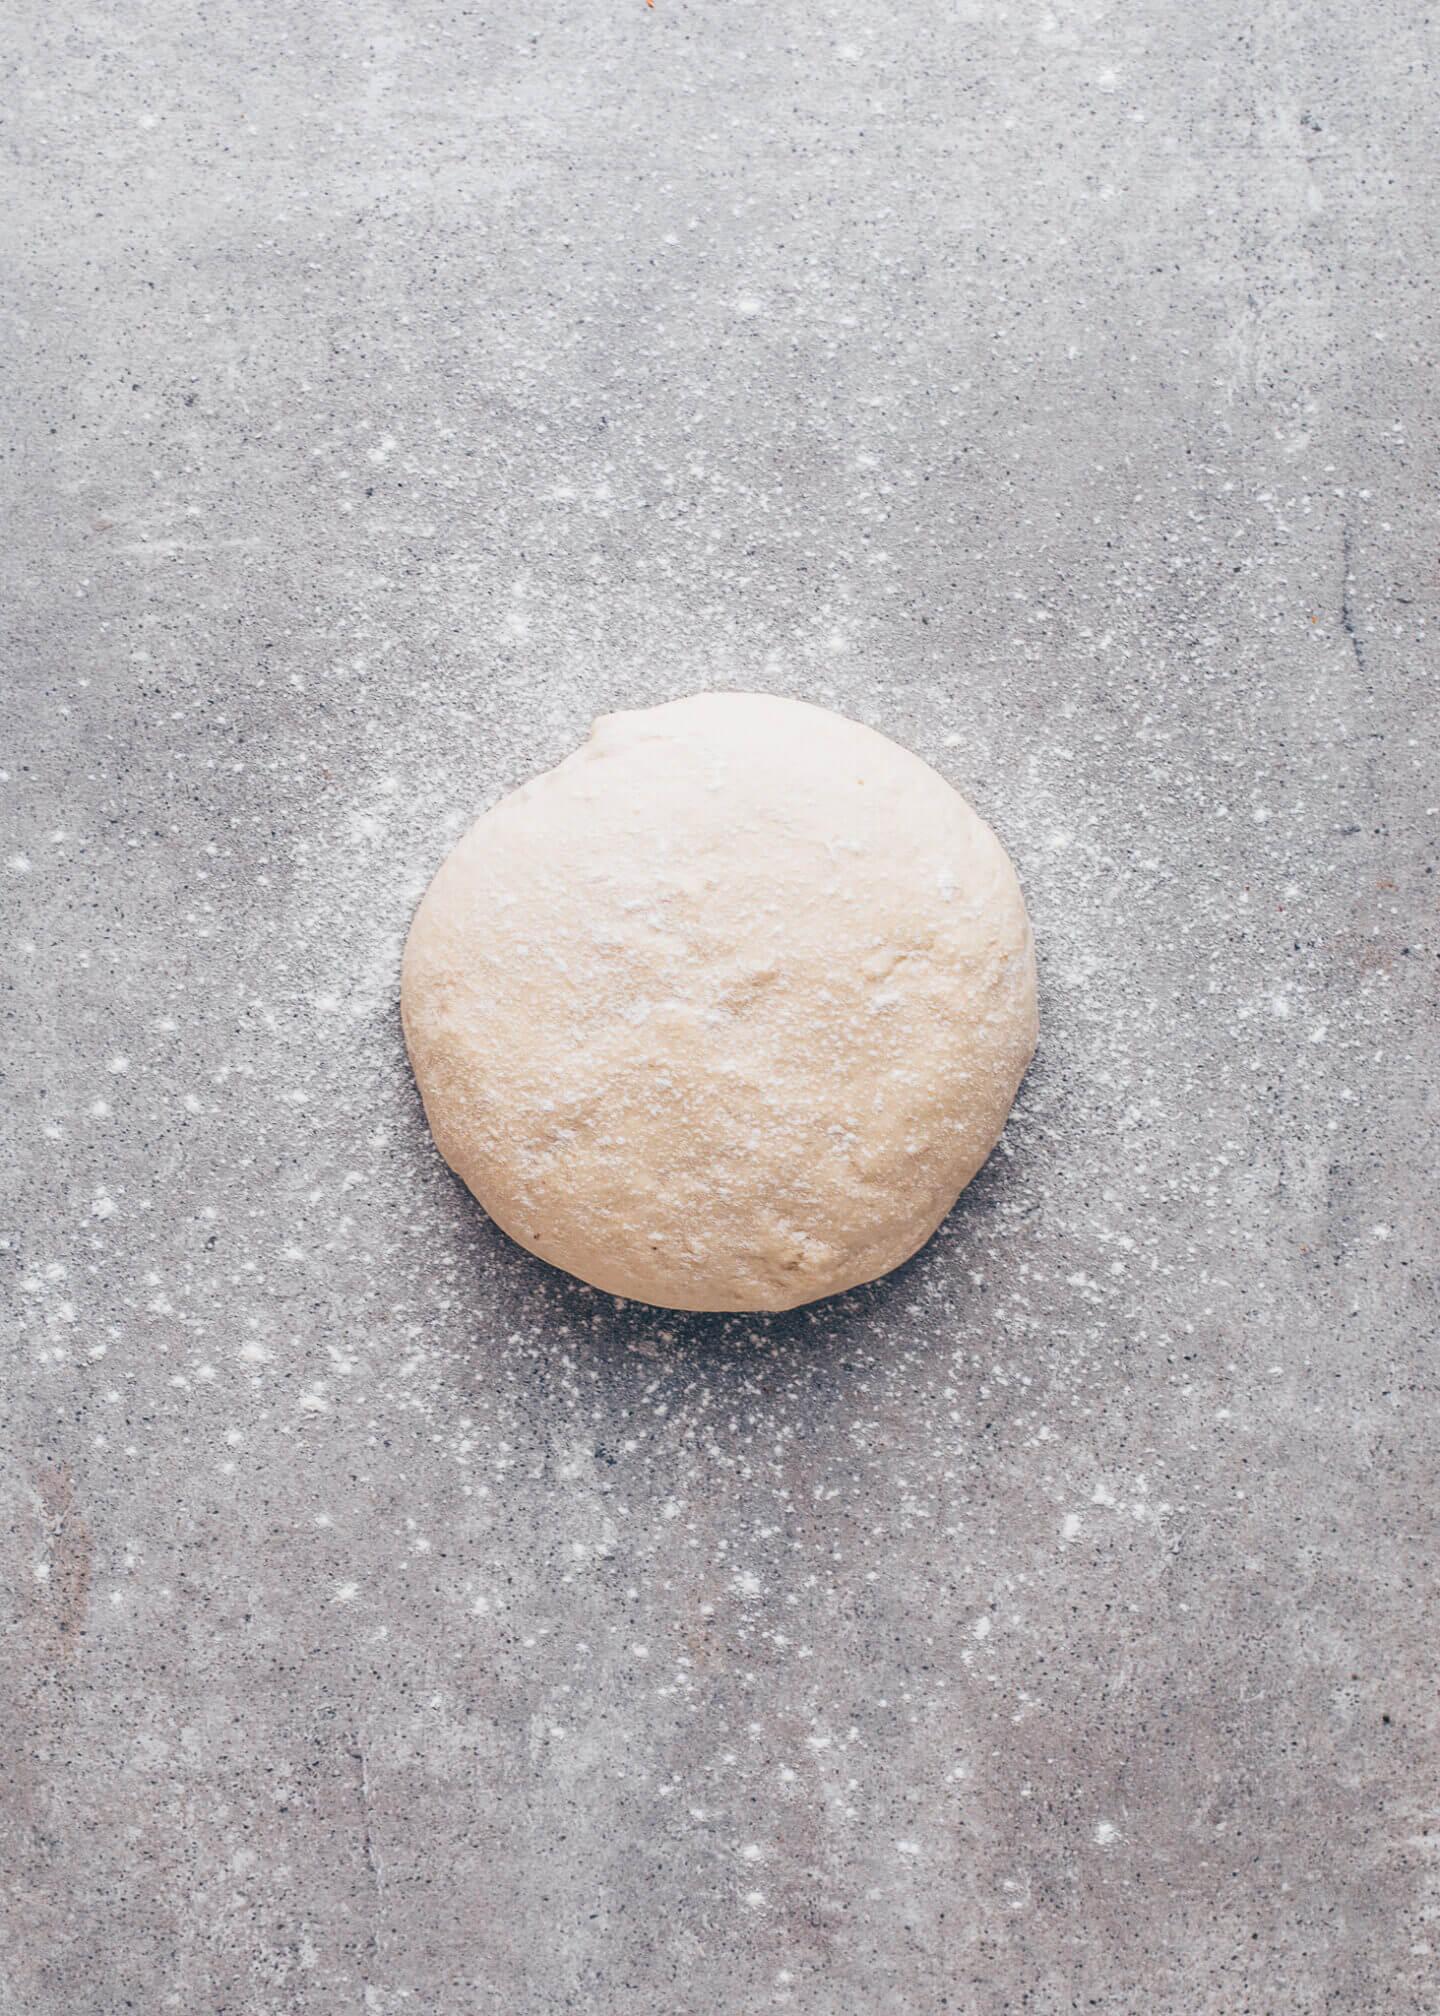 Pizza flatbread yeast dough